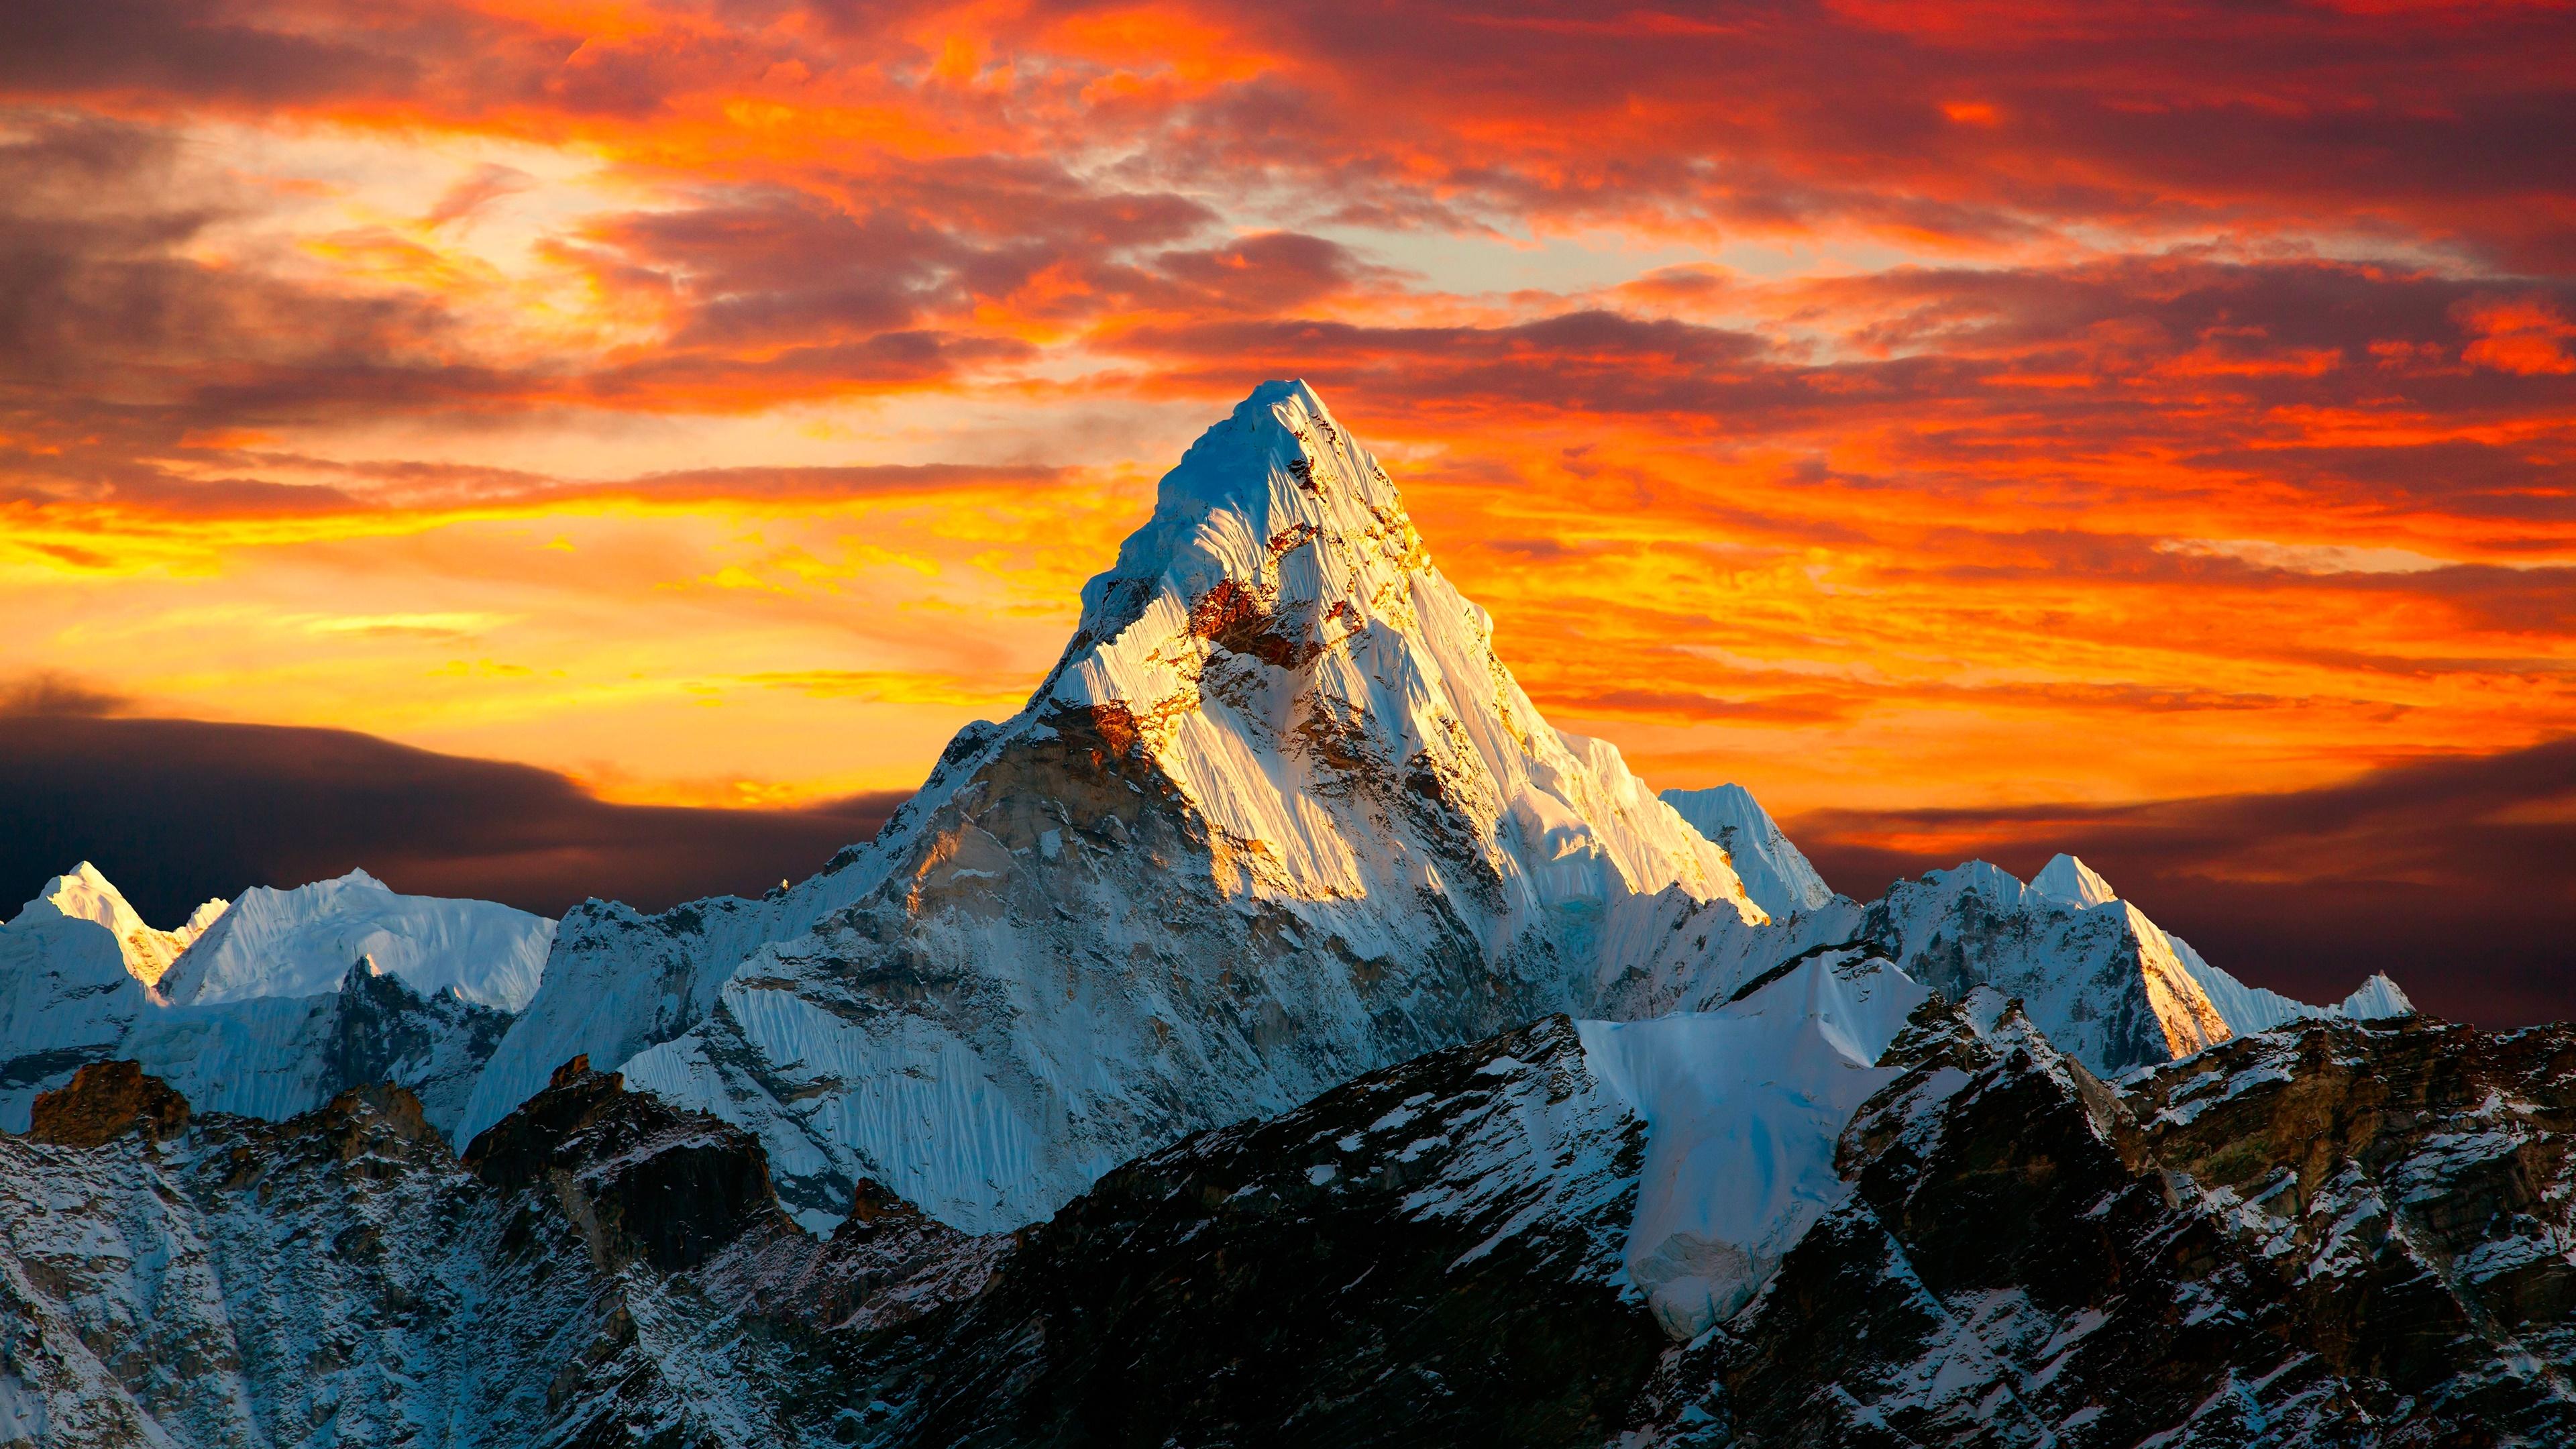 Himalayas mountains landscape 4k hd nature 4k wallpapers - Himalaya pictures wallpaper ...